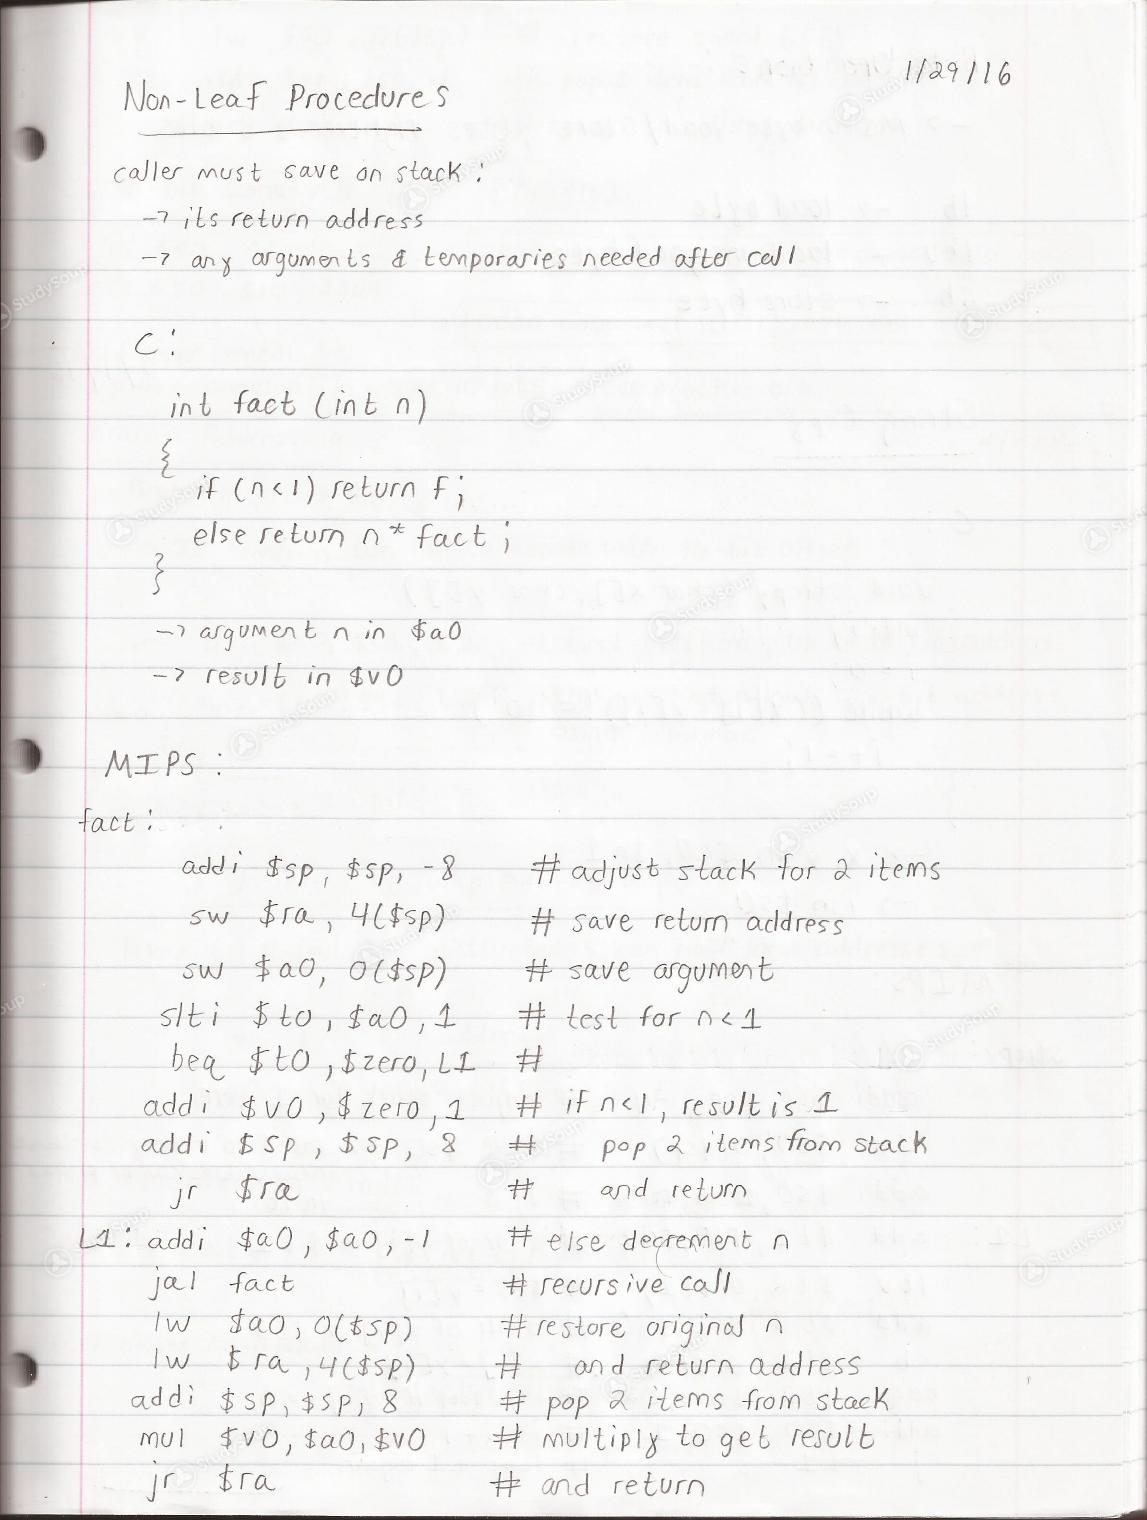 Penn State - CMPEH 331 - Class Notes - Week 1 | StudySoup